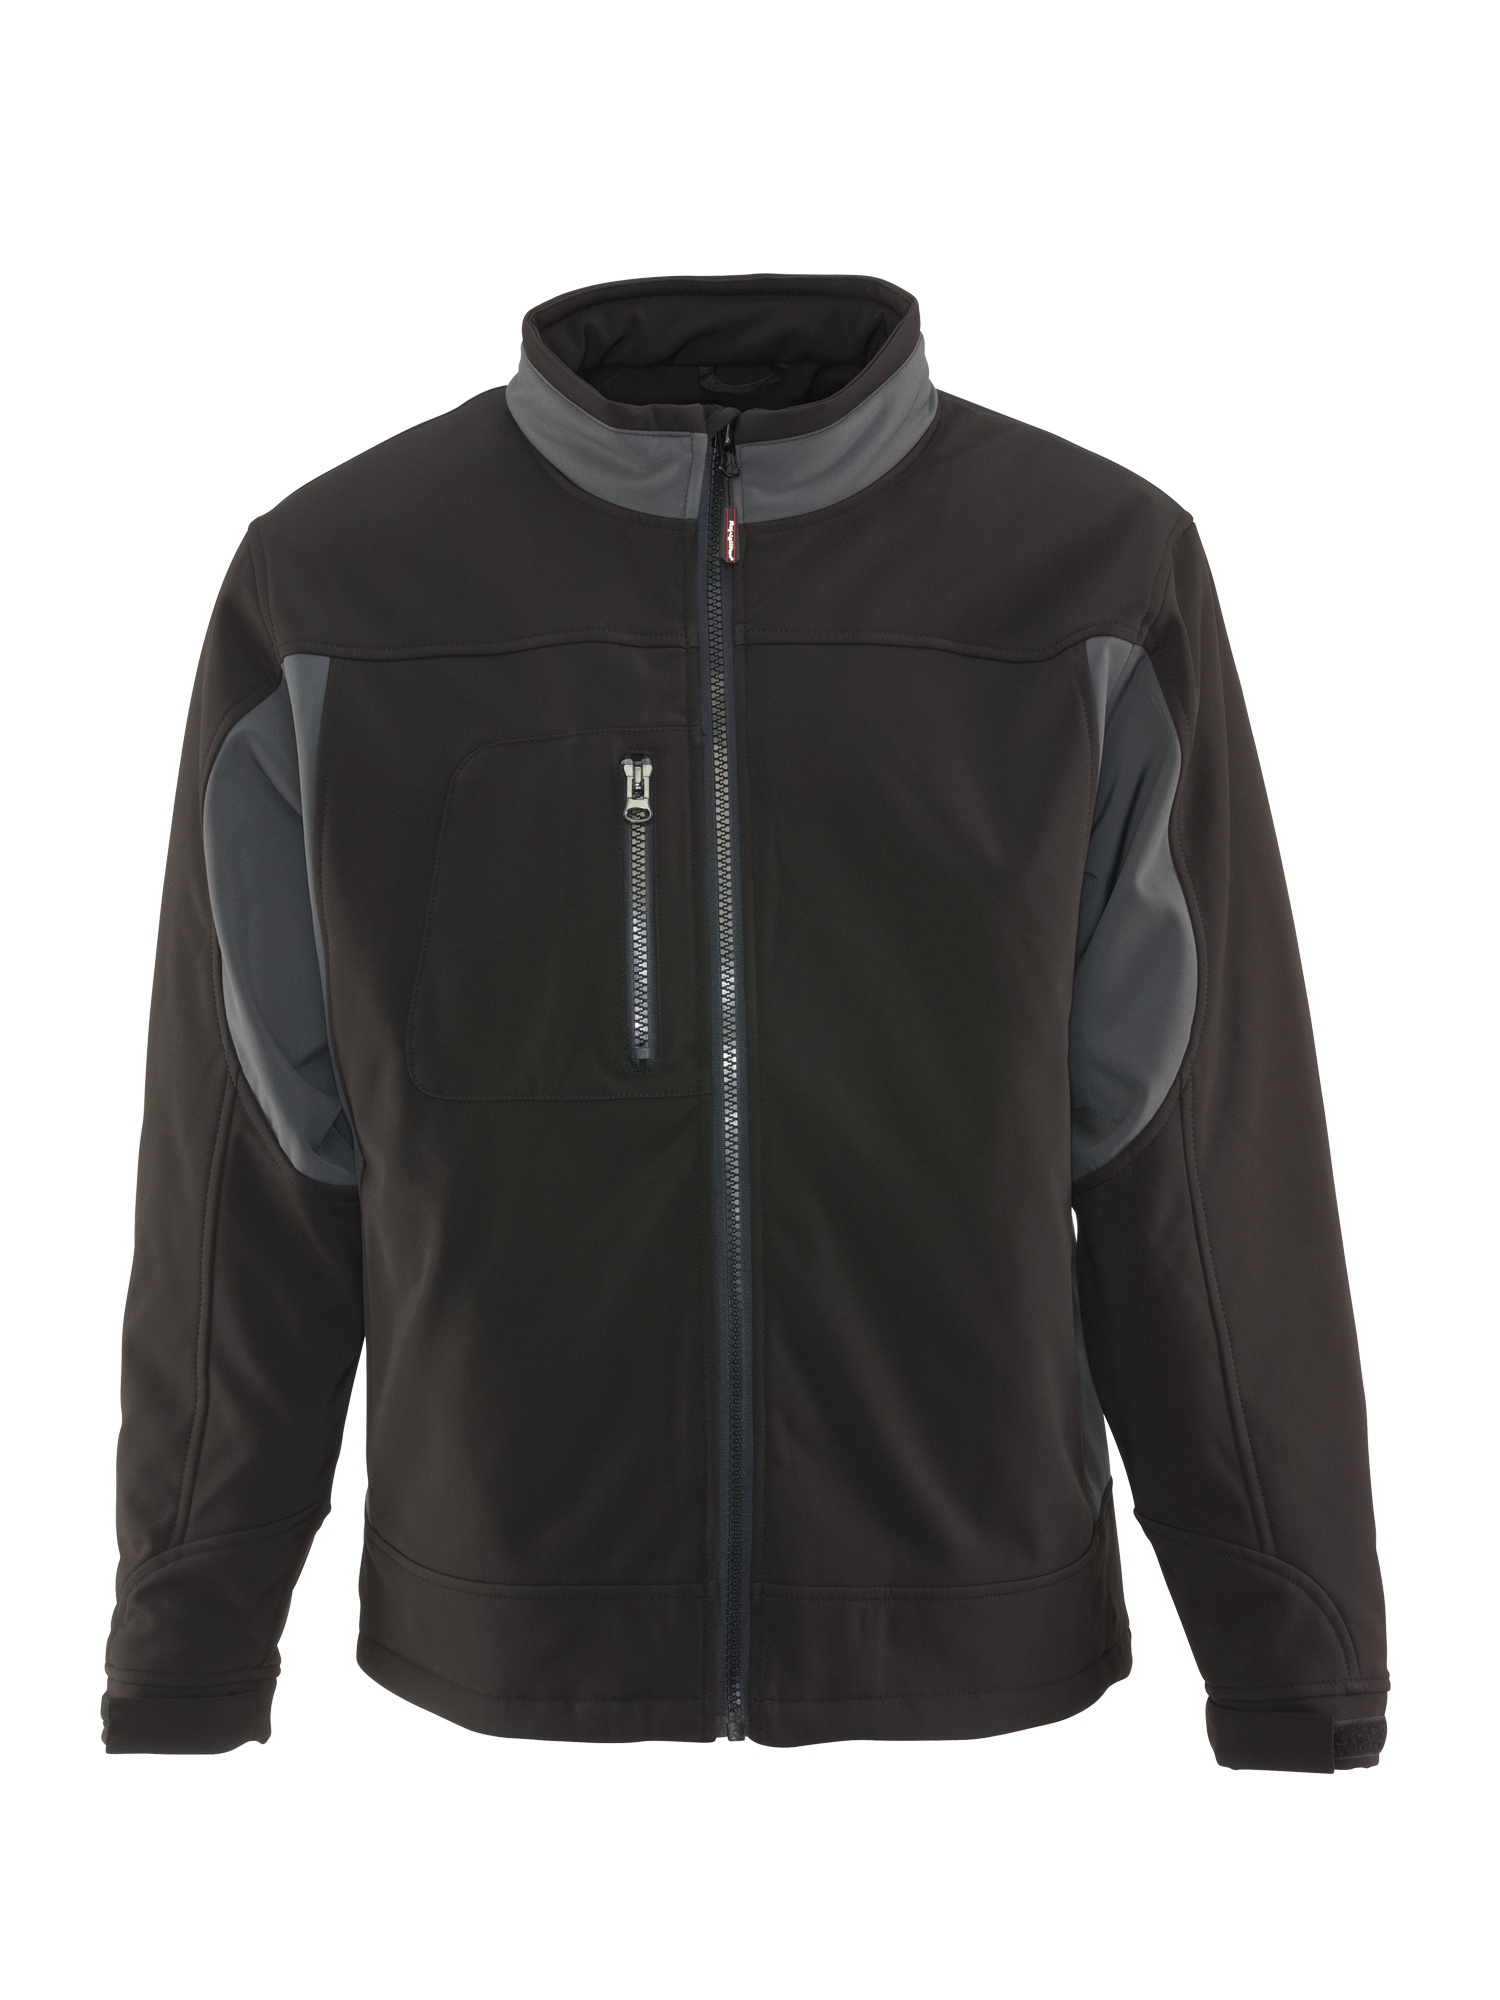 57ba78ac955 Jackets for Men - Quality Waterproof Men s Winter Work Coats